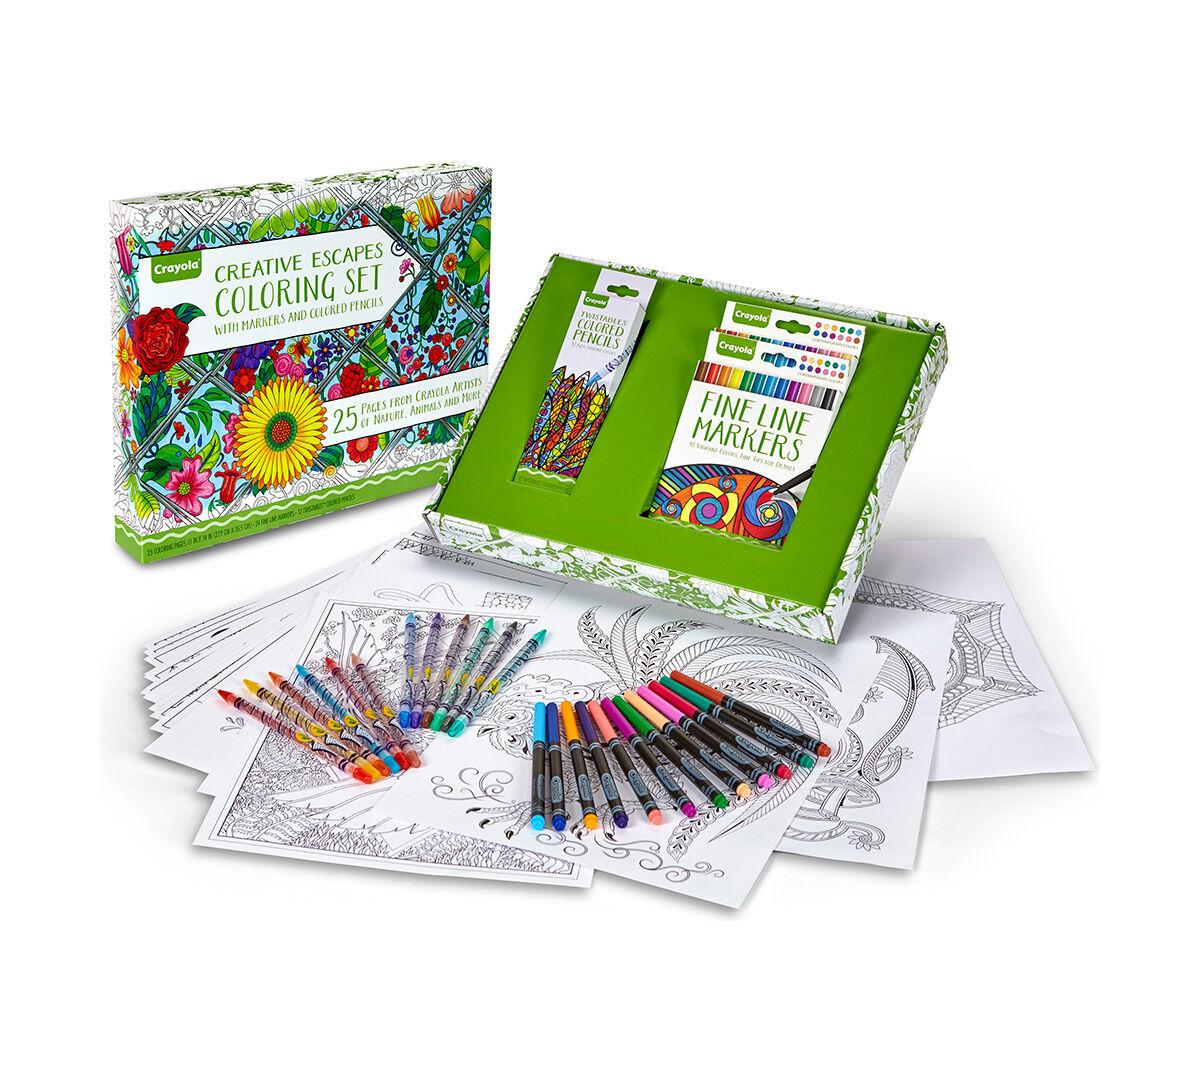 Creative Escapes Coloring Set- Large Gift Set - Crayola